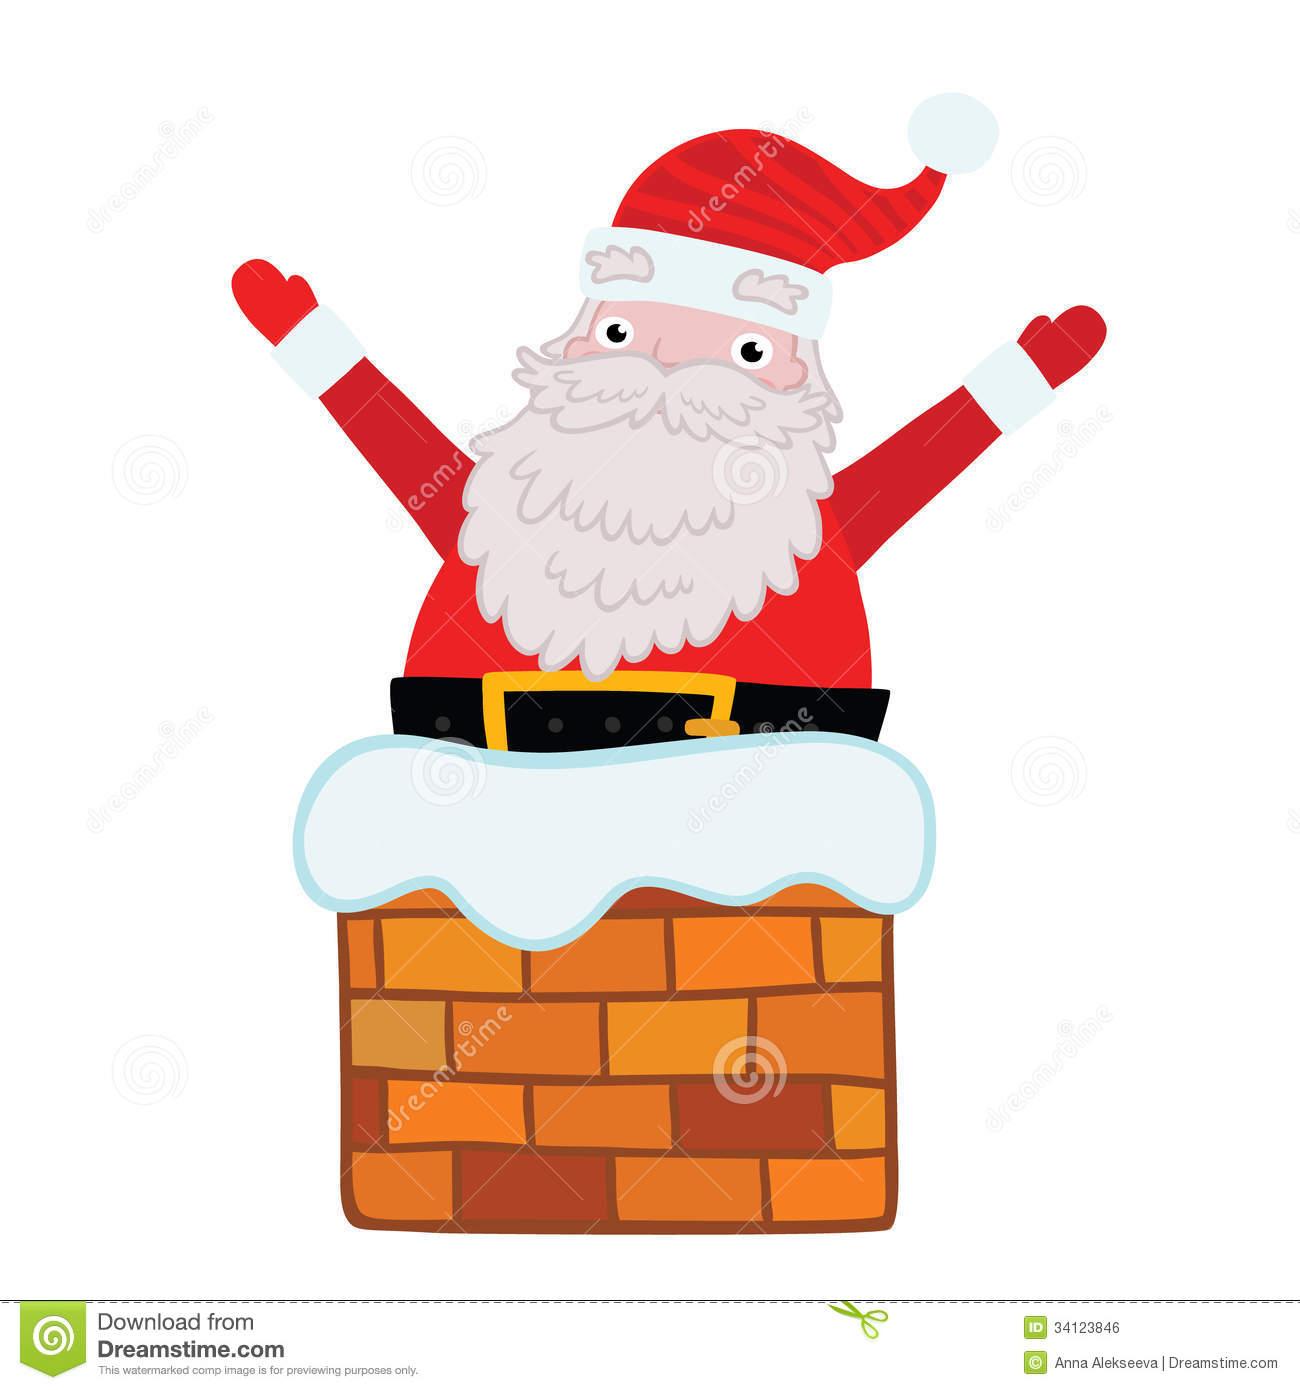 Chimney clipart santa chimney, Chimney santa chimney.